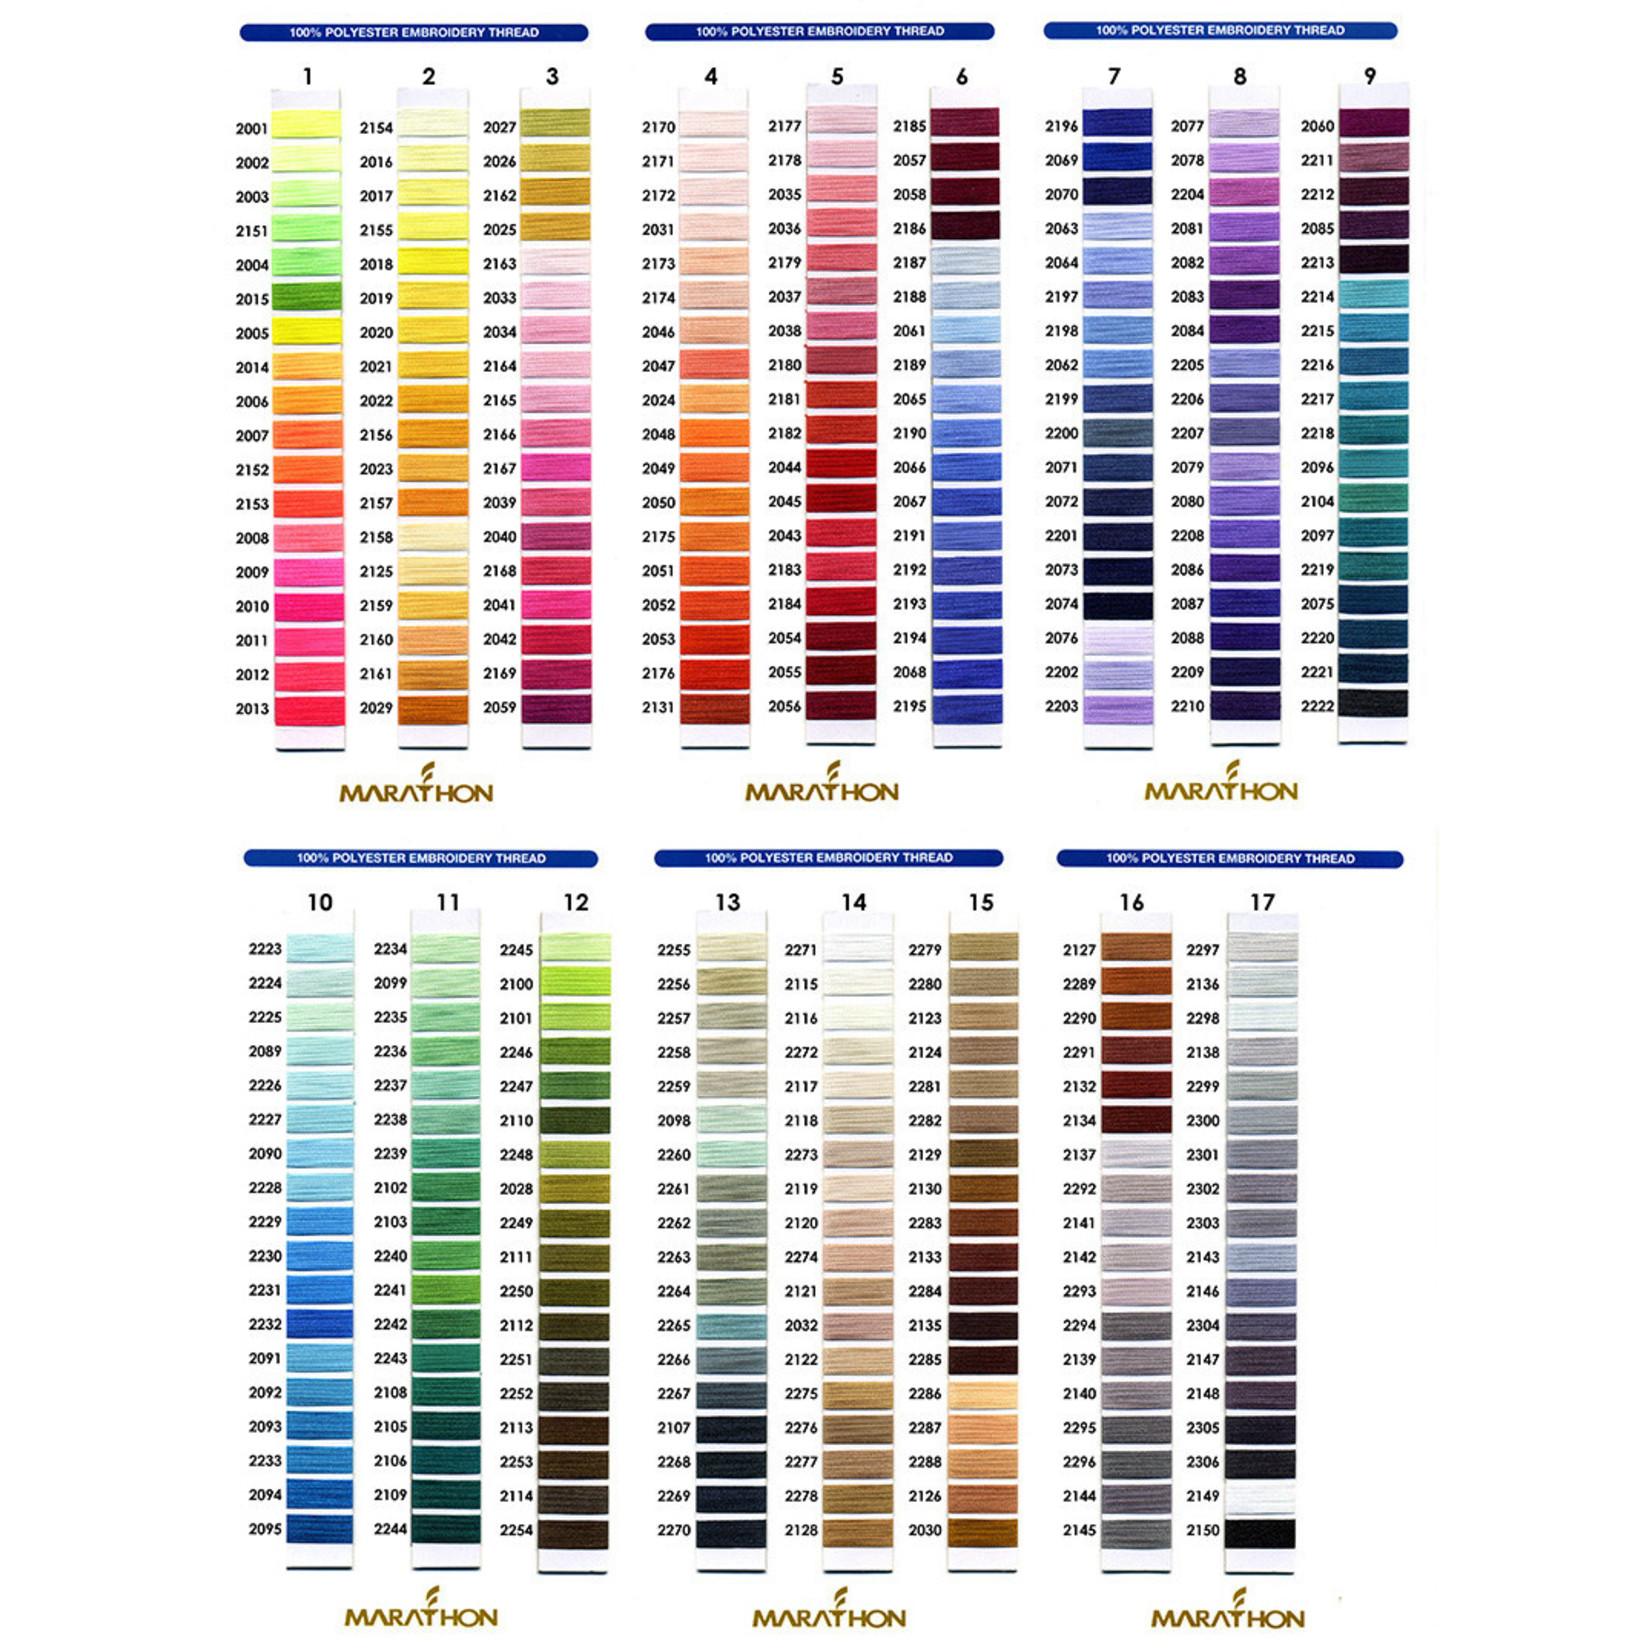 MARATHON Colour 2288 - 5000mtr POLY EMBROIDERY THREAD